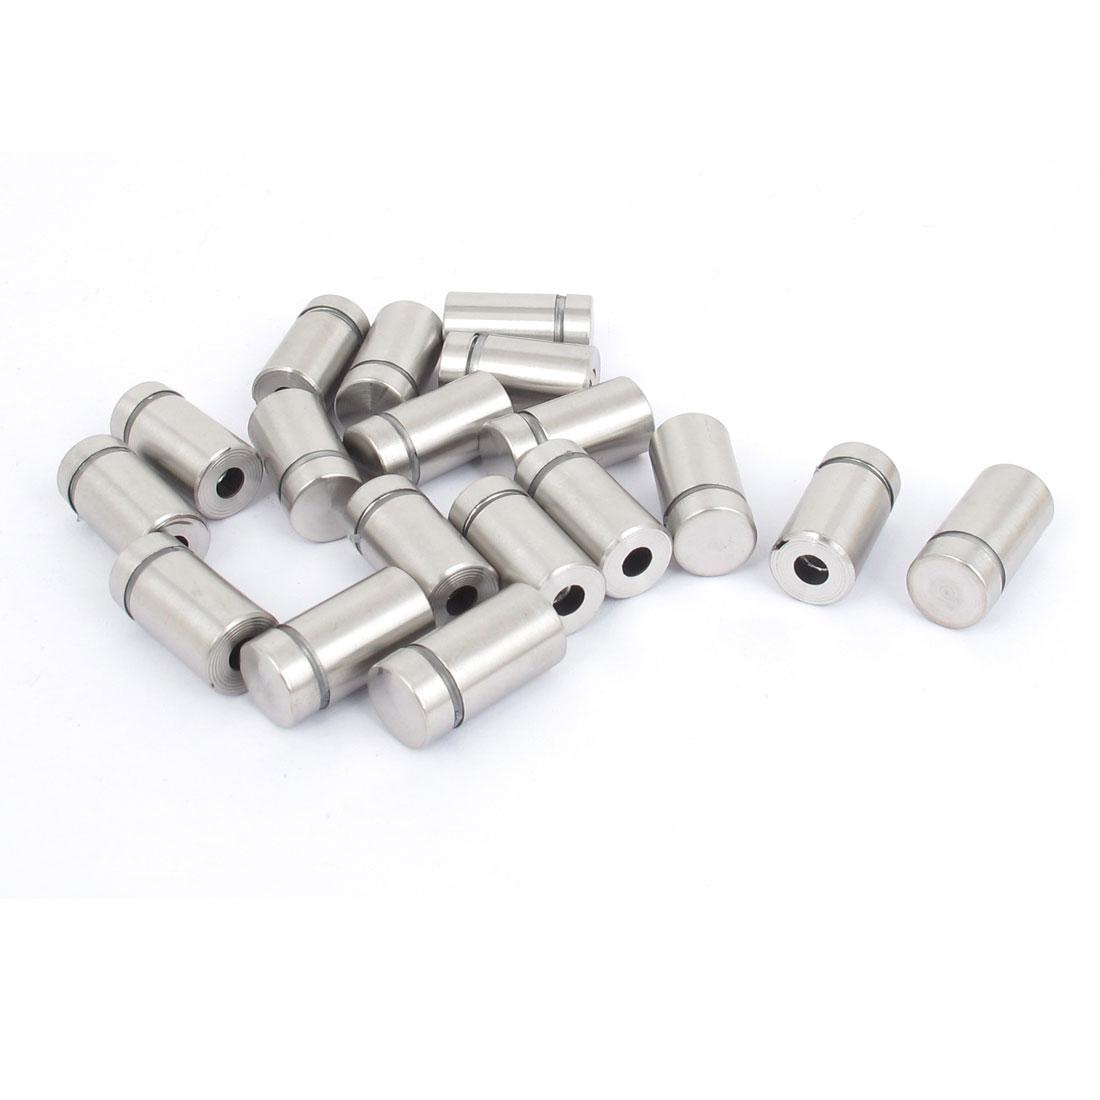 12mm x 22mm Stainless Steel Advertising Frameless Glass Standoff Pins 18pcs